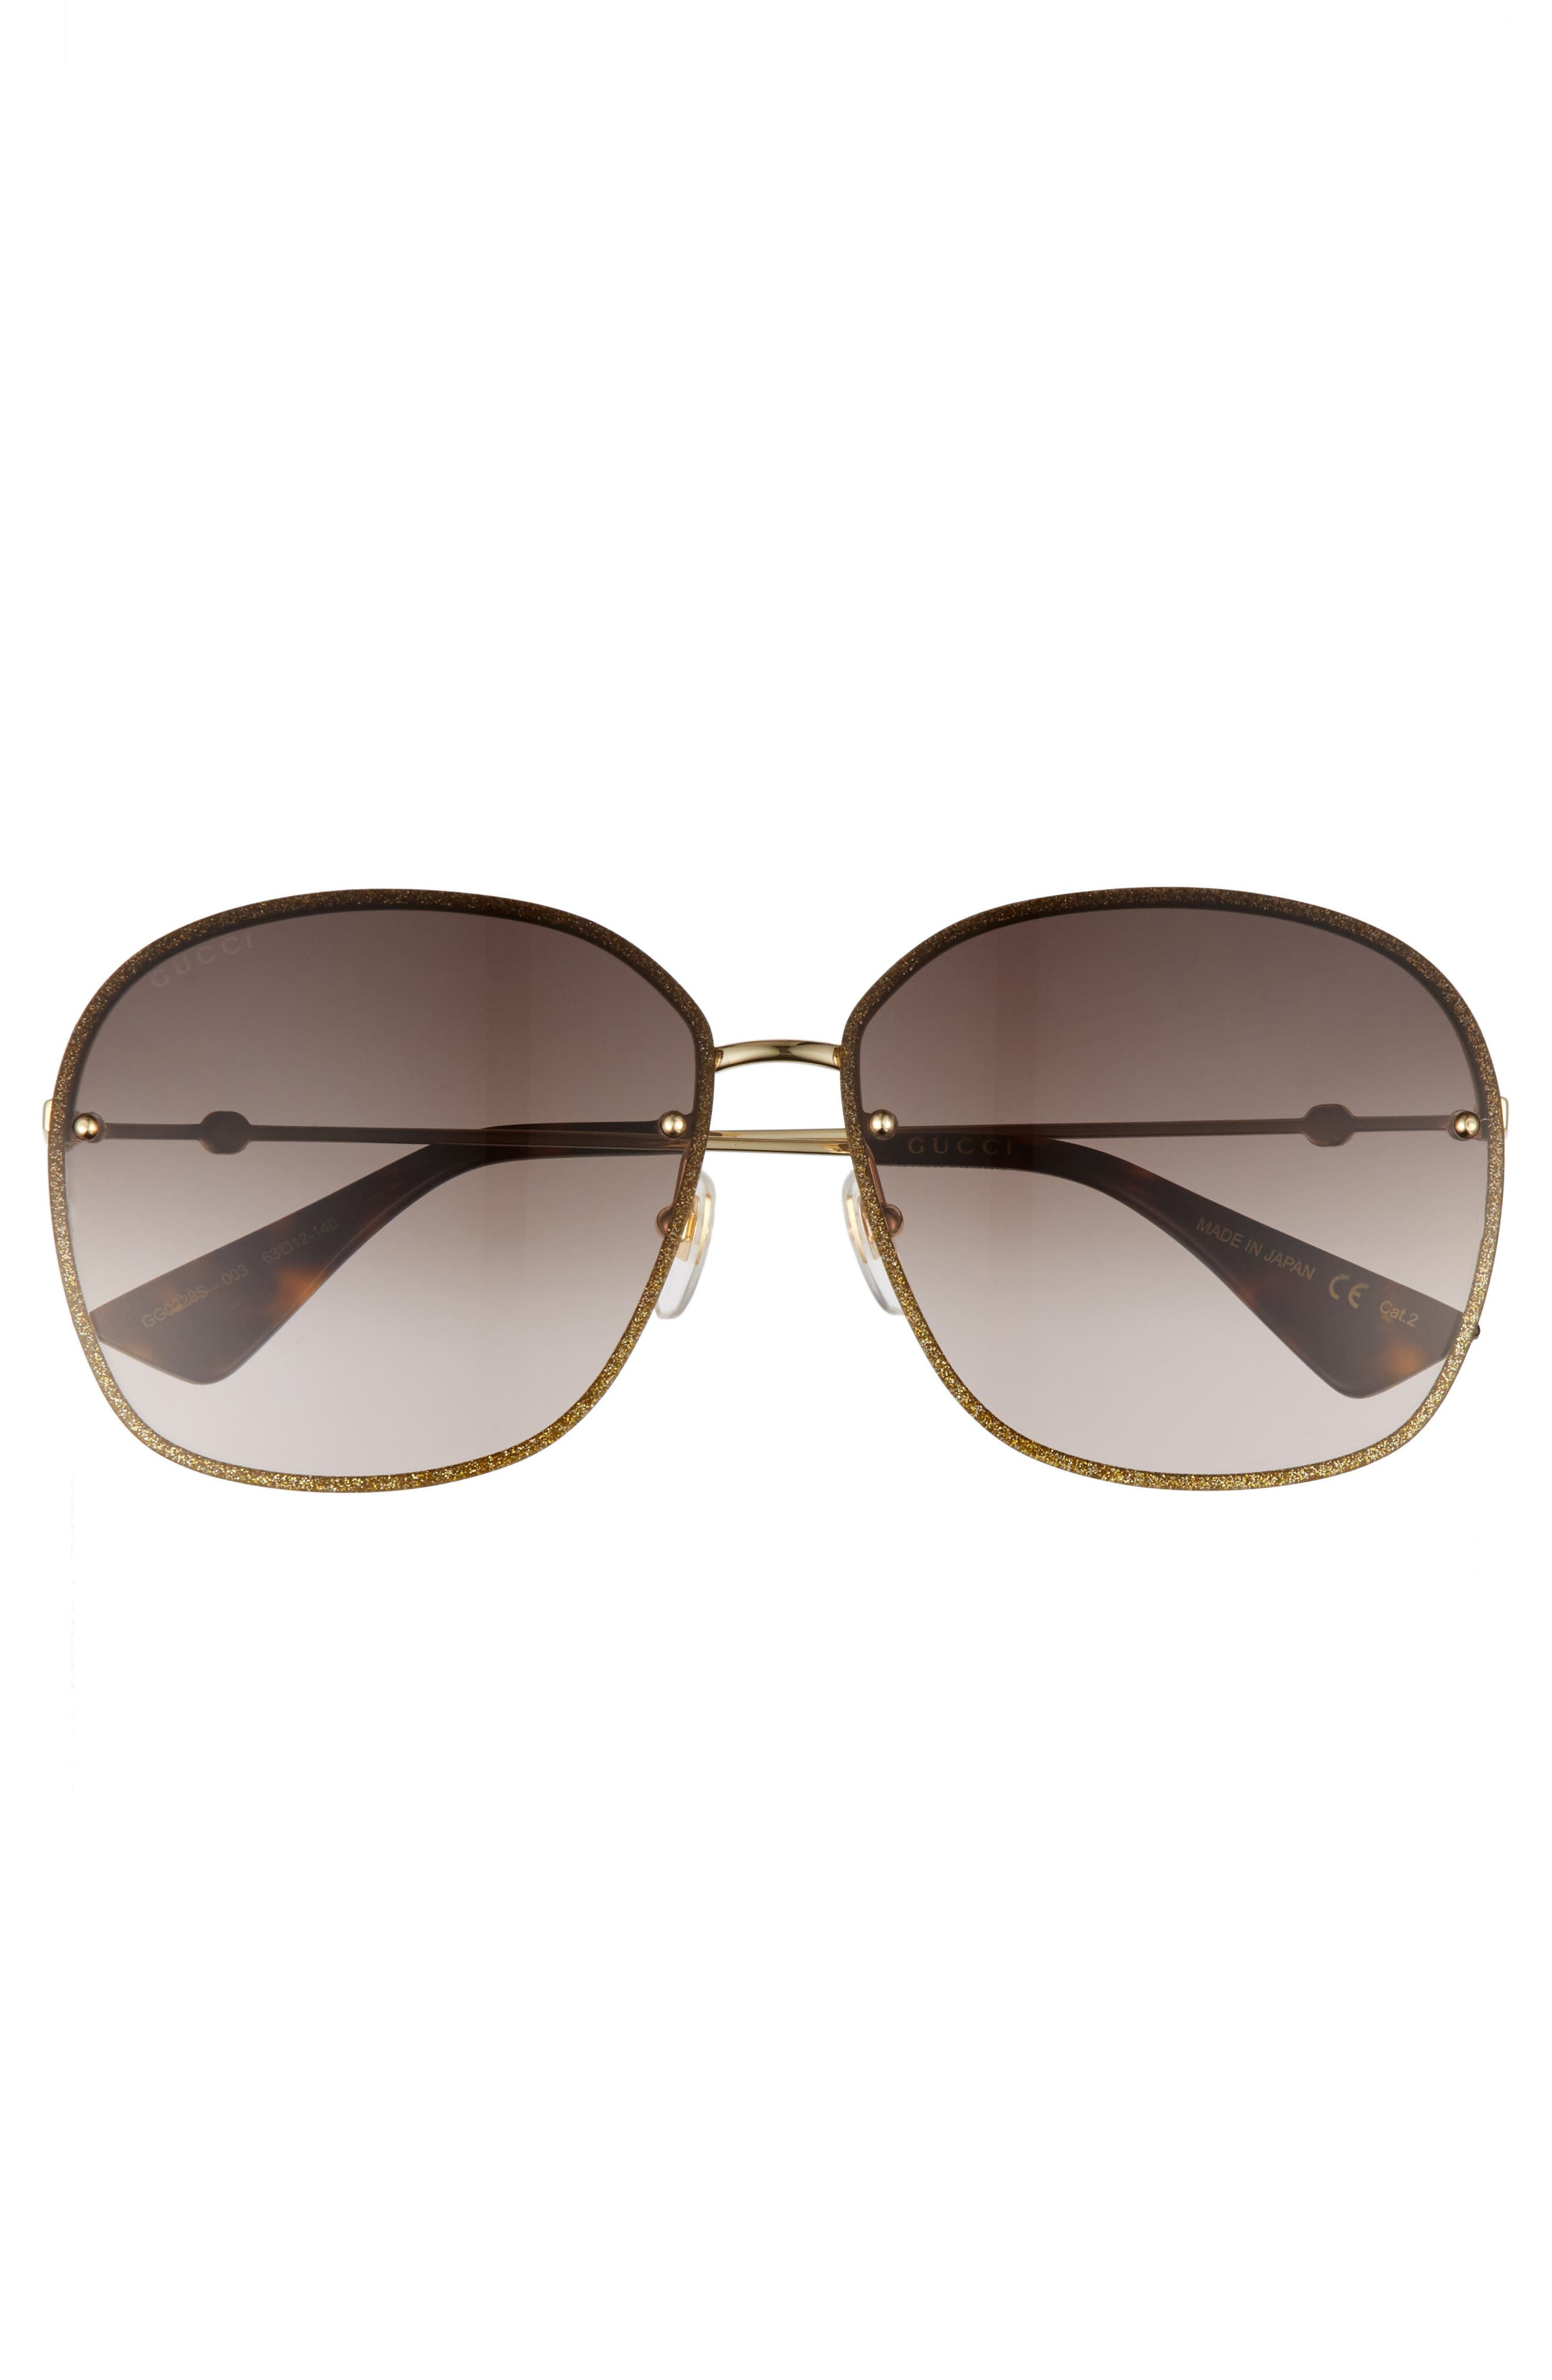 63mm Oversize Square Sunglasses,                             Alternate thumbnail 3, color,                             Gold/ Brown